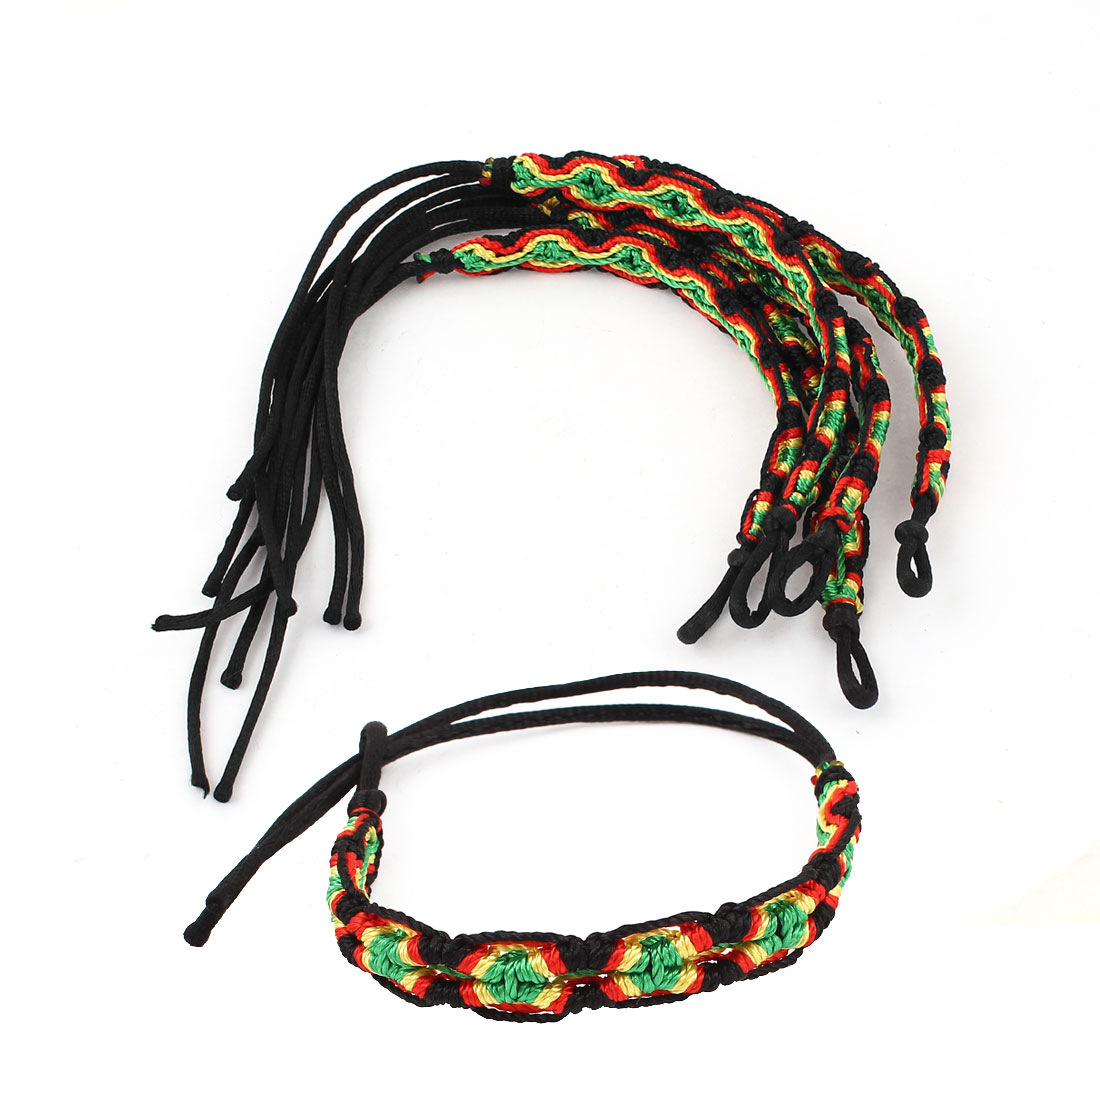 5 Pcs Black Green Nylon Cord Hand Made Braided Wrist Decor Bracelet for Ladies